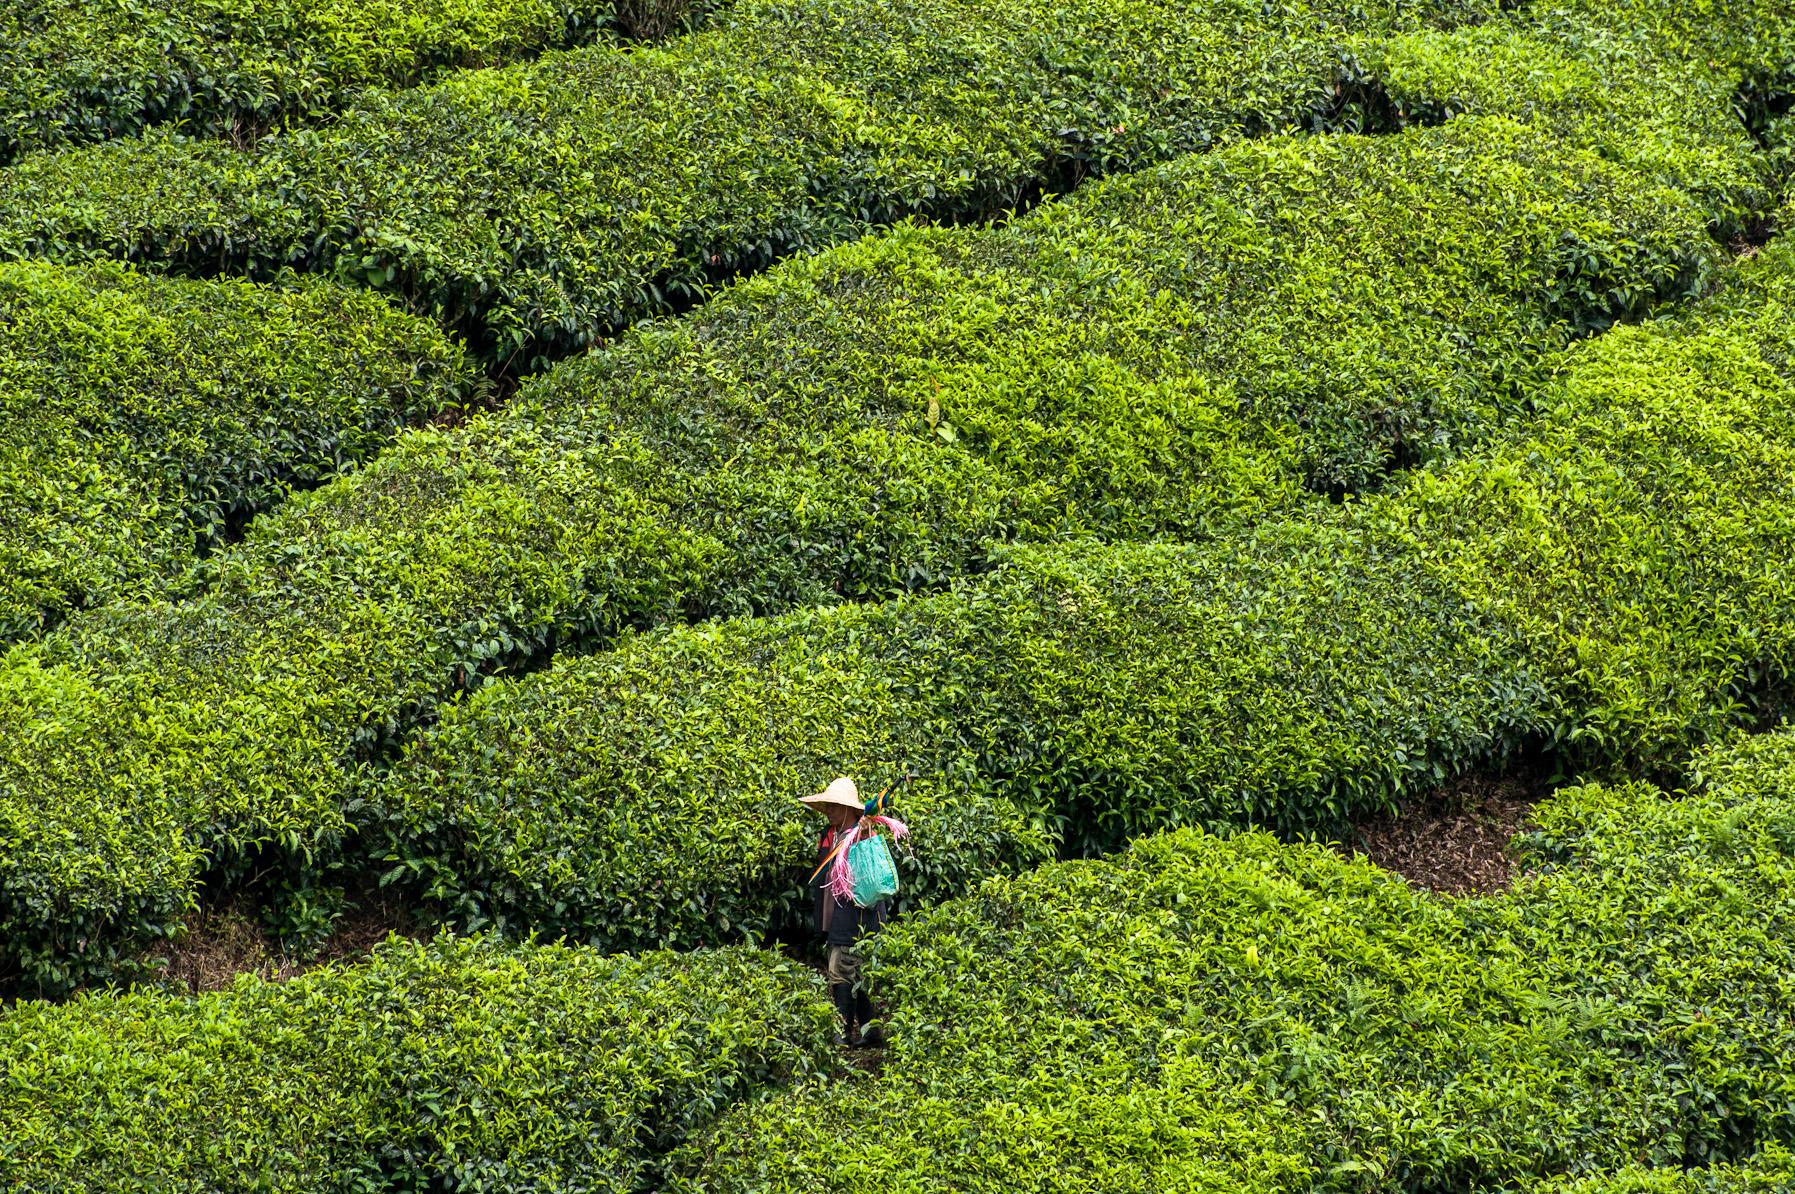 Herbaciane pole